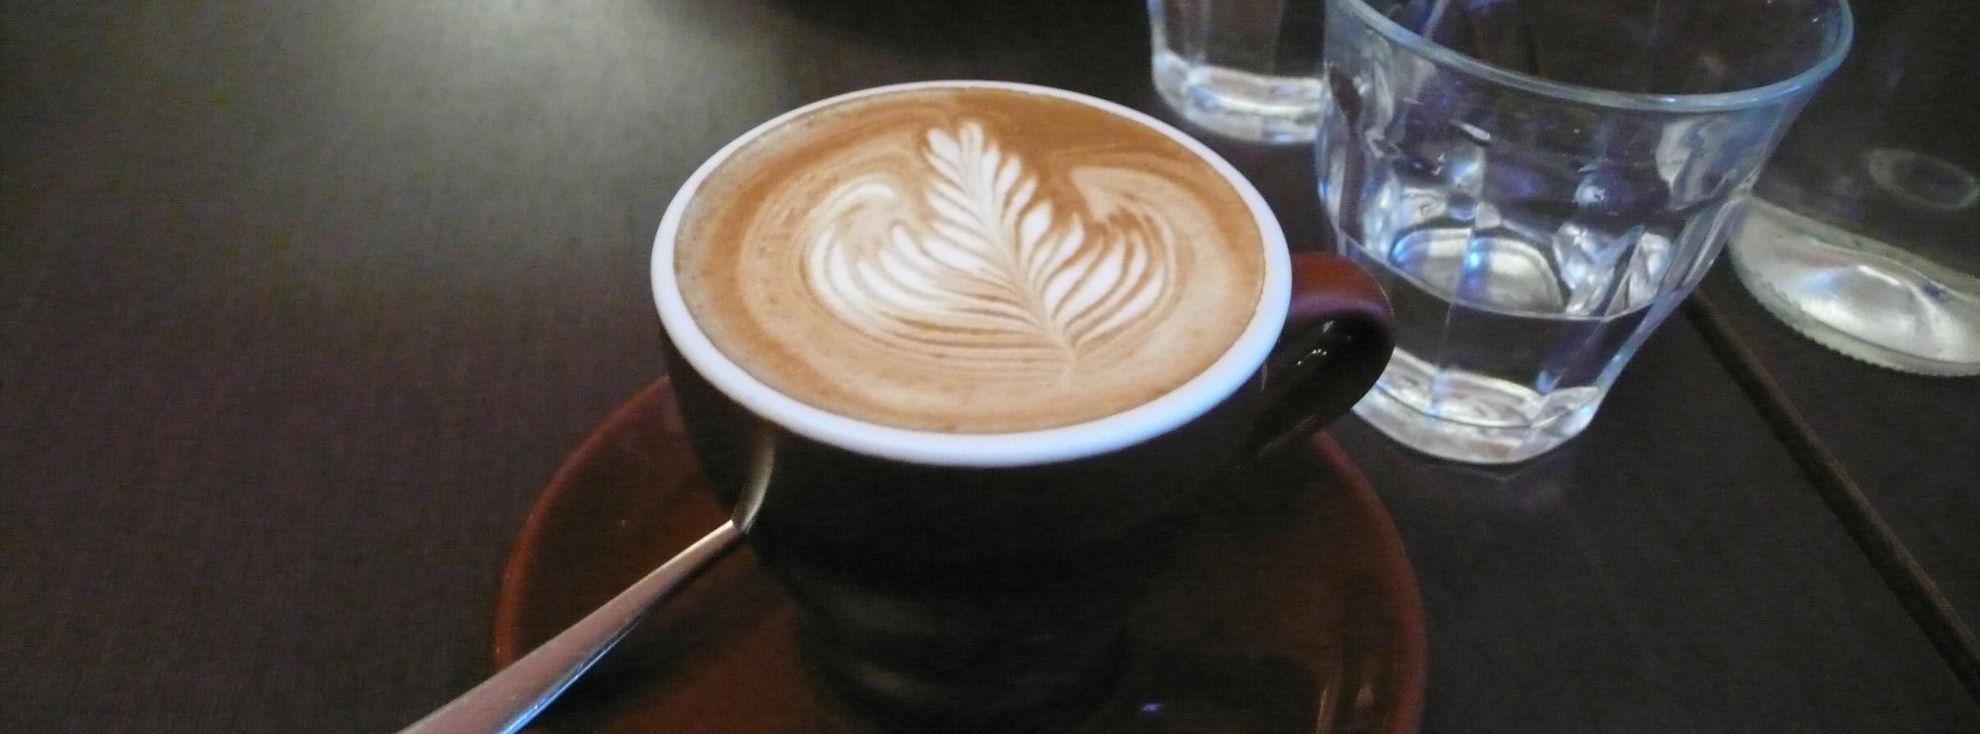 Explore Spring Espresso